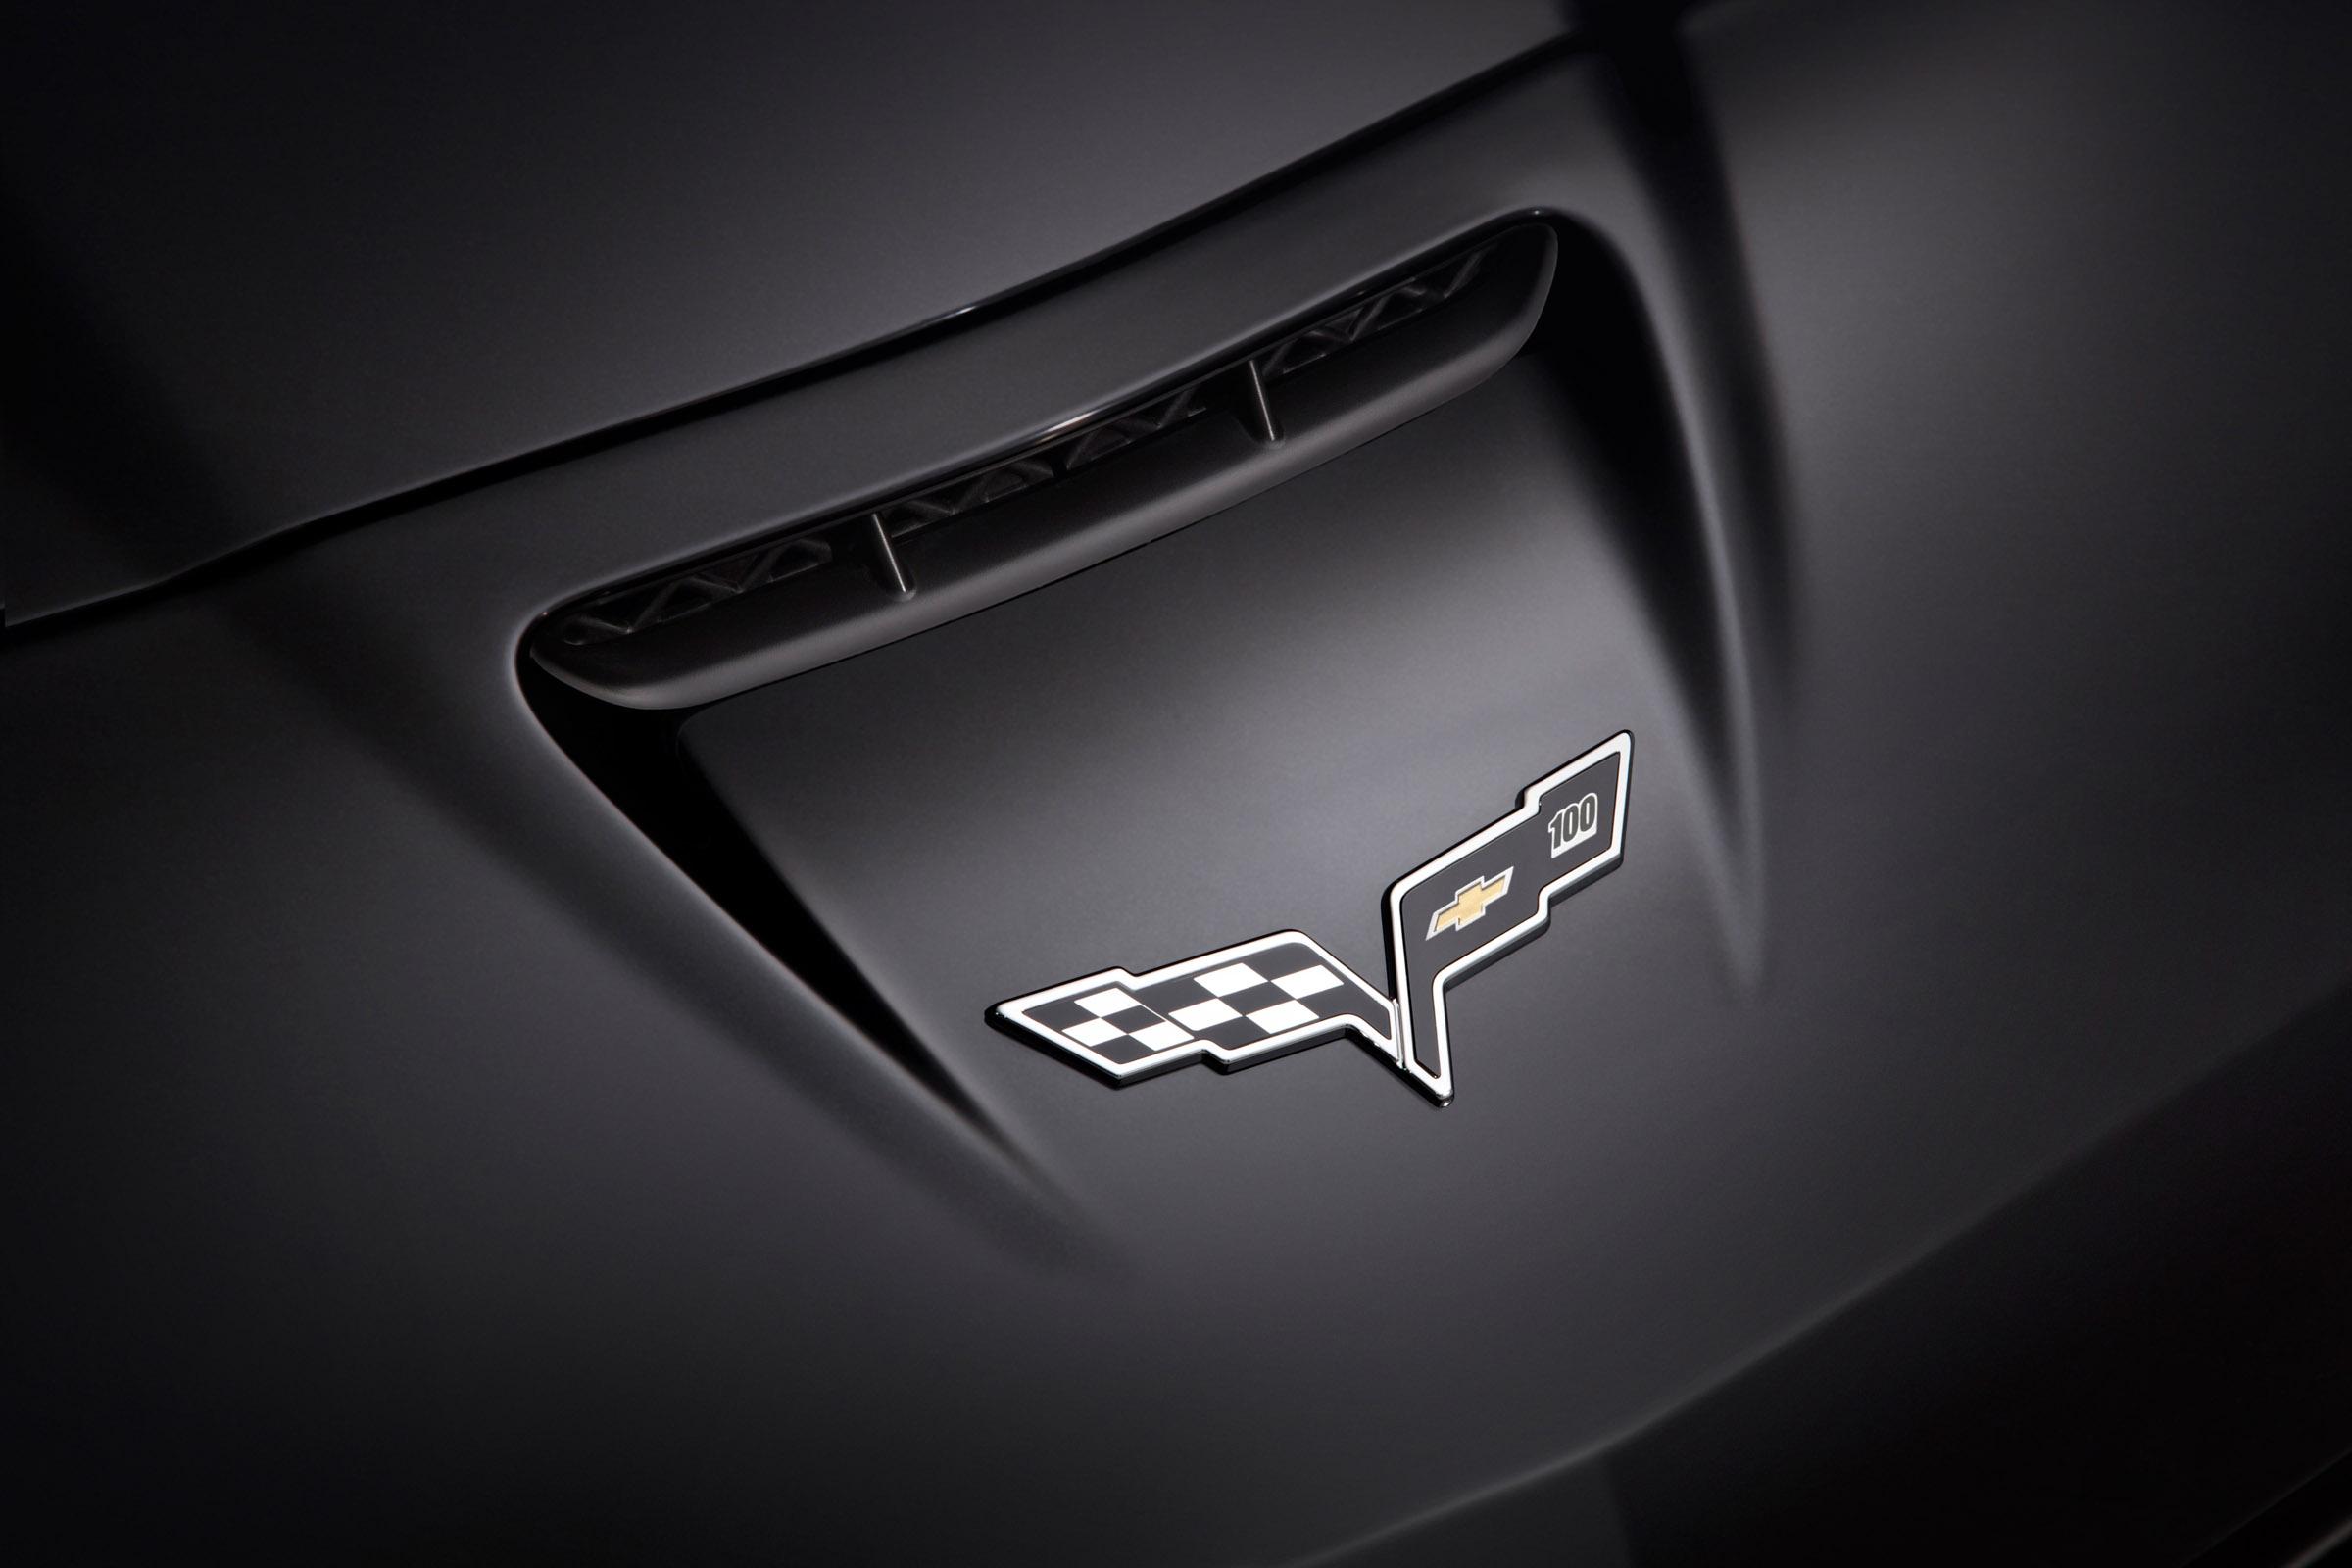 2012 Chevrolet Centennial Edition Corvette Z06 Picture #5 of 9